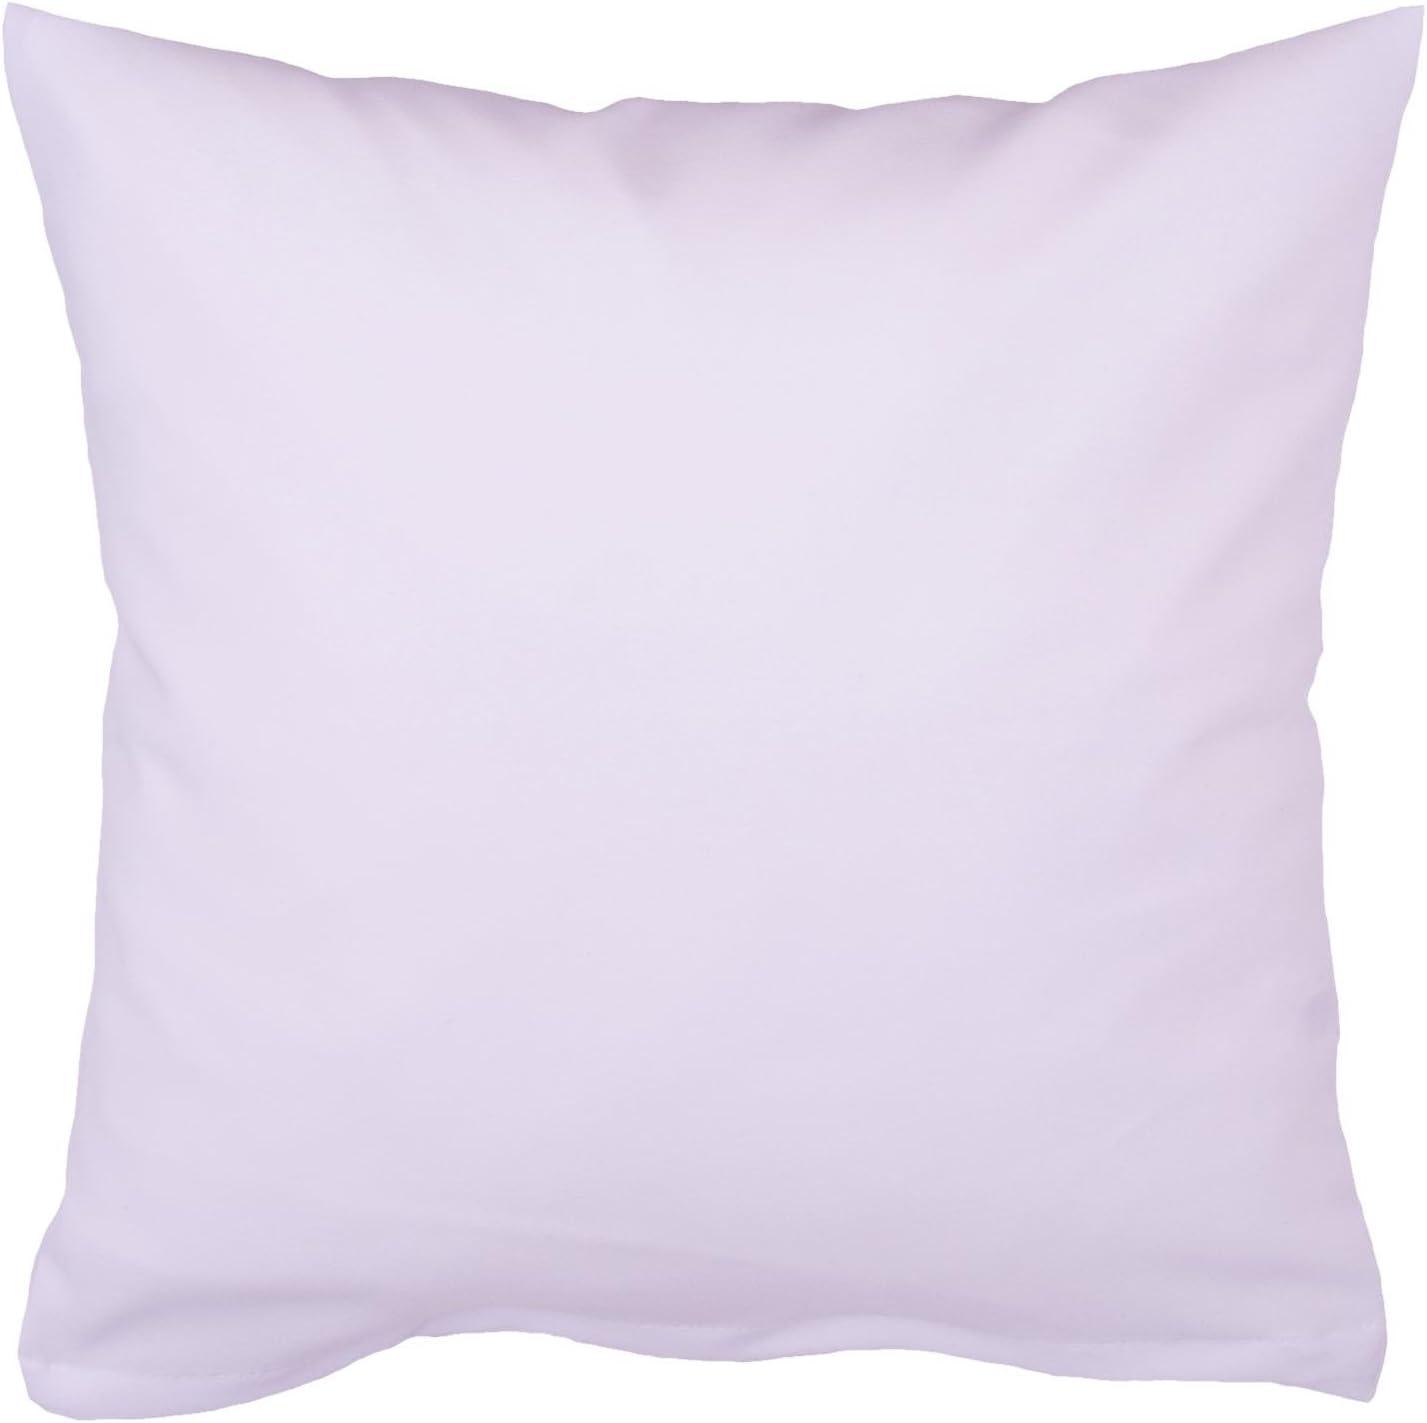 Hans-Textil-Shop Kissenbezug 20x30 cm Wei/ß Baumwolle Deko, Sofa, Kissen, Kopfkissen, Kissenh/ülle